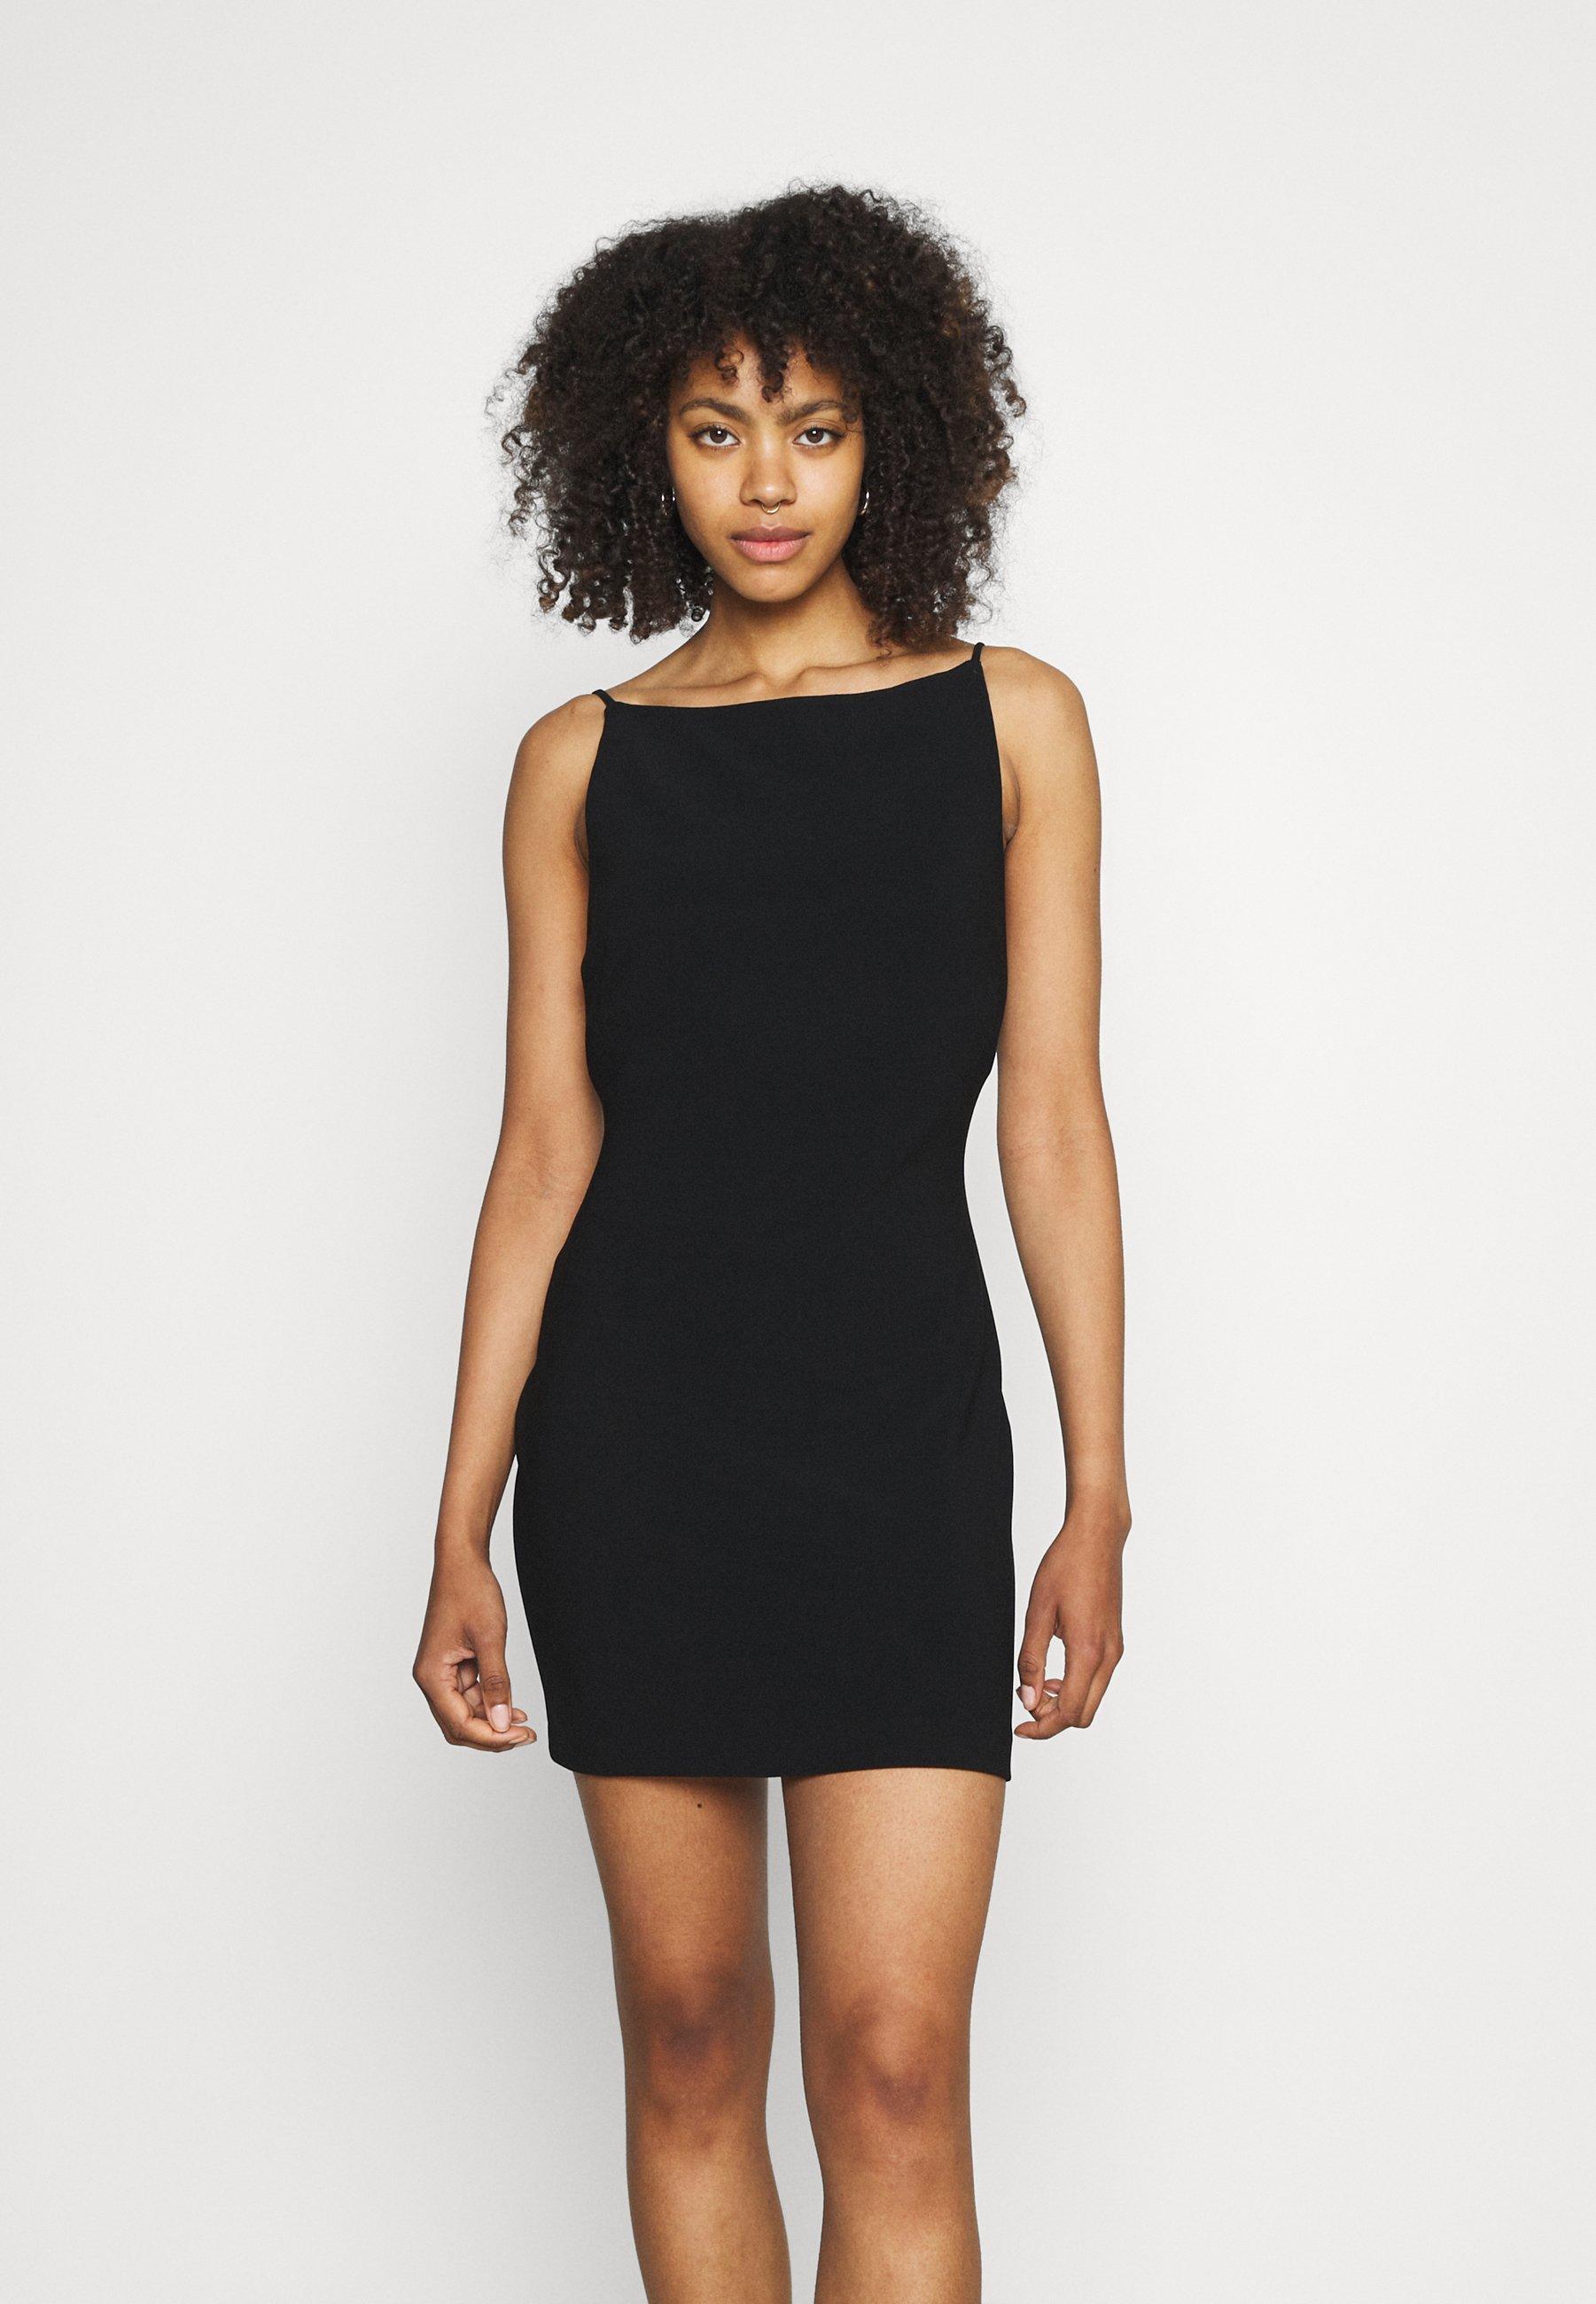 Women MADDISON BOAT DRESS - Cocktail dress / Party dress